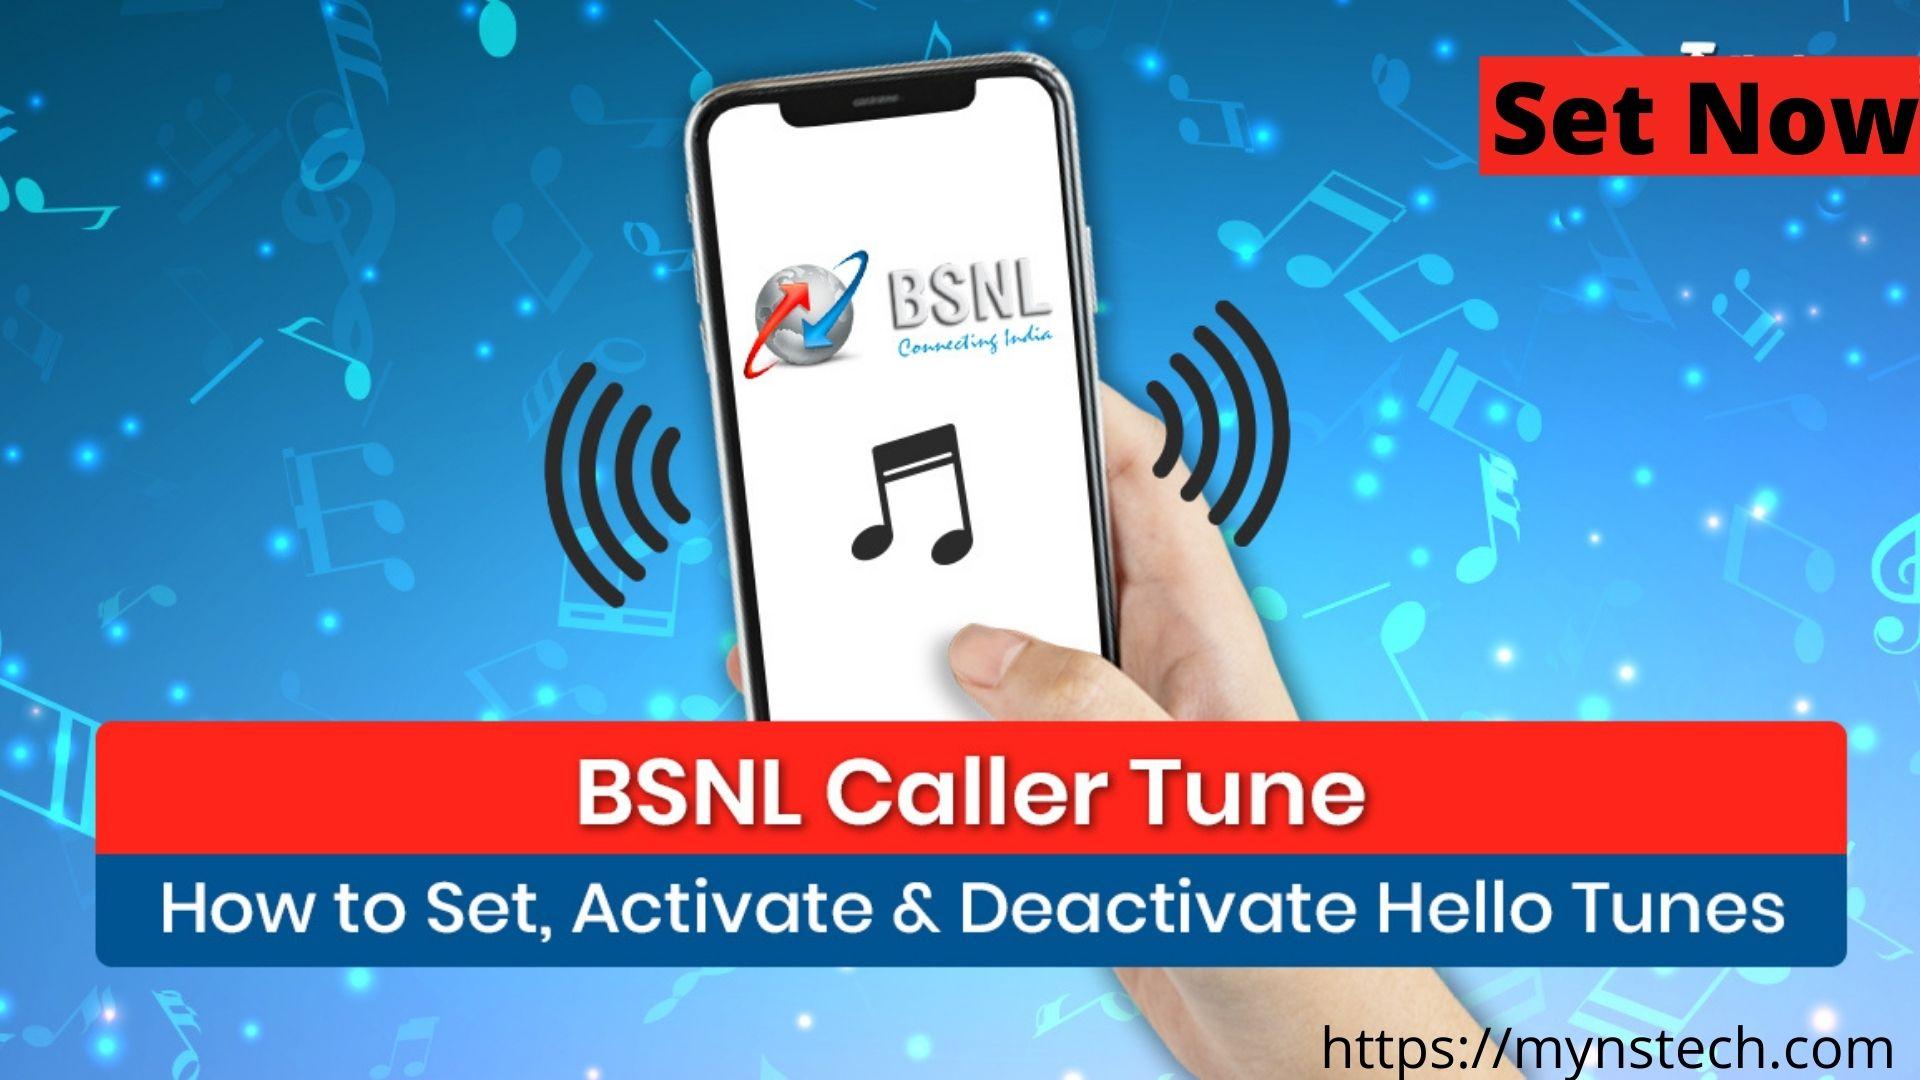 how to set bsnl caller tune